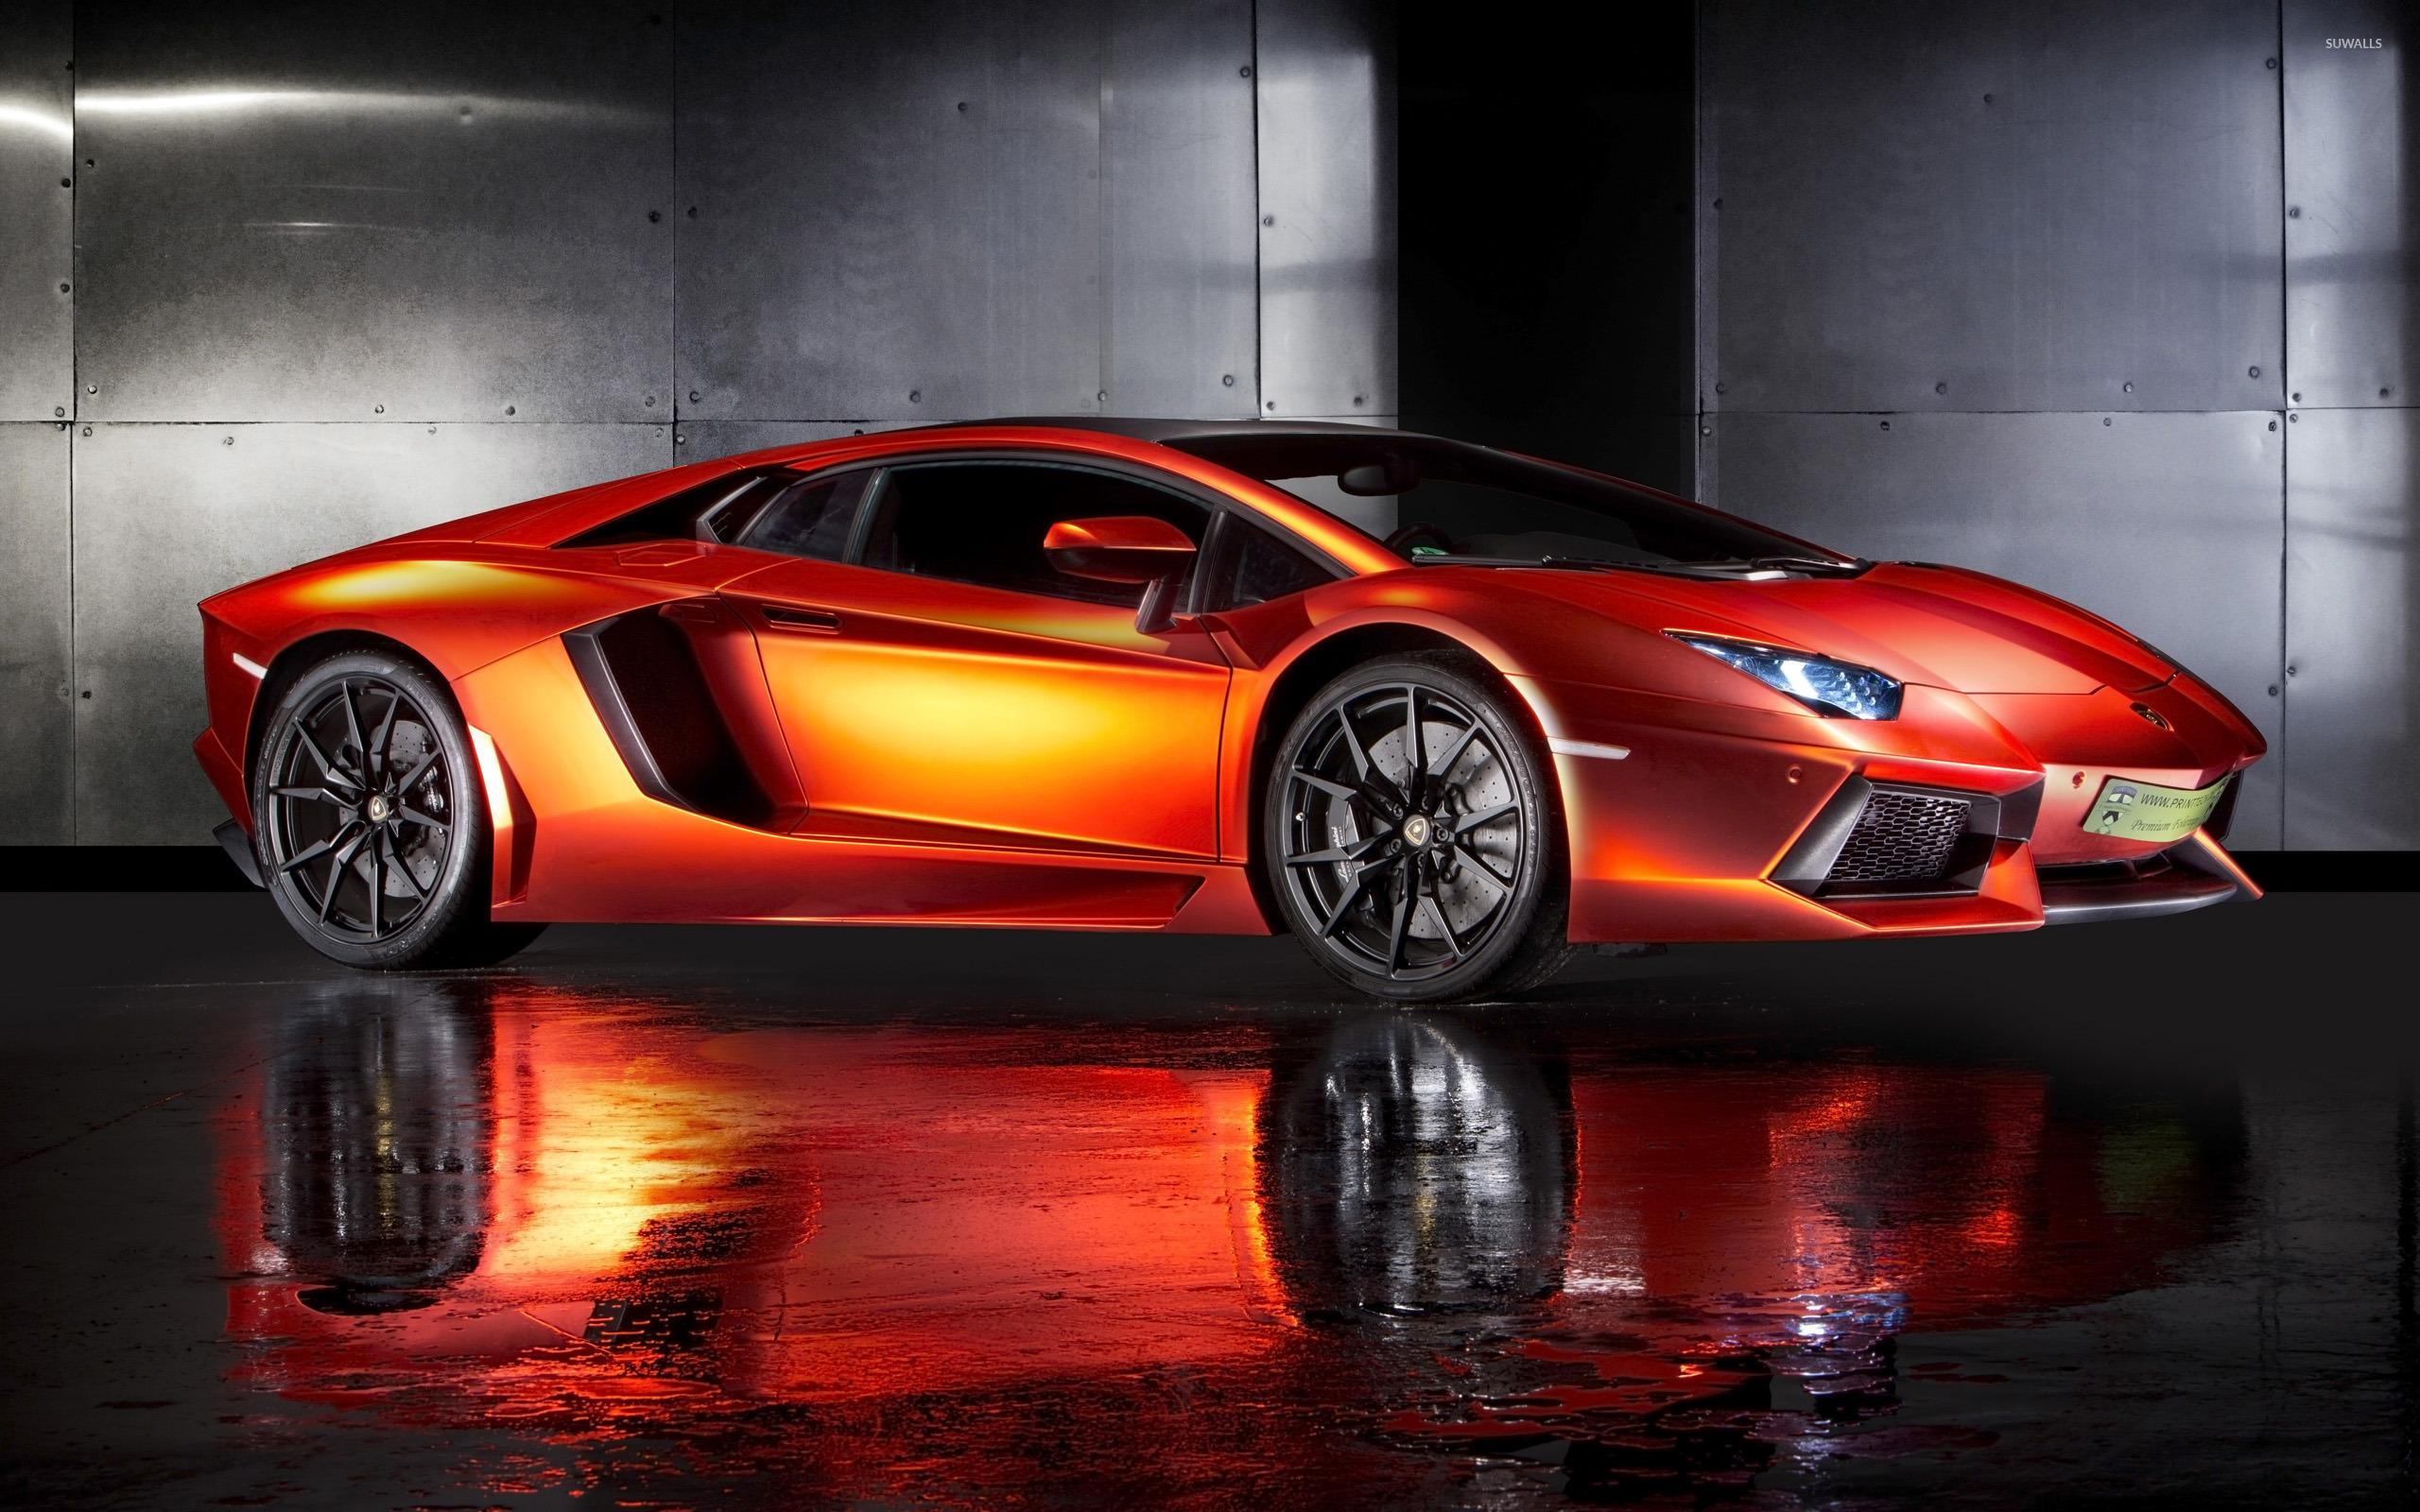 2013 lamborghini aventador wallpaper 2560x1600 jpg - Lamborghini Veneno Roadster Iphone Wallpaper